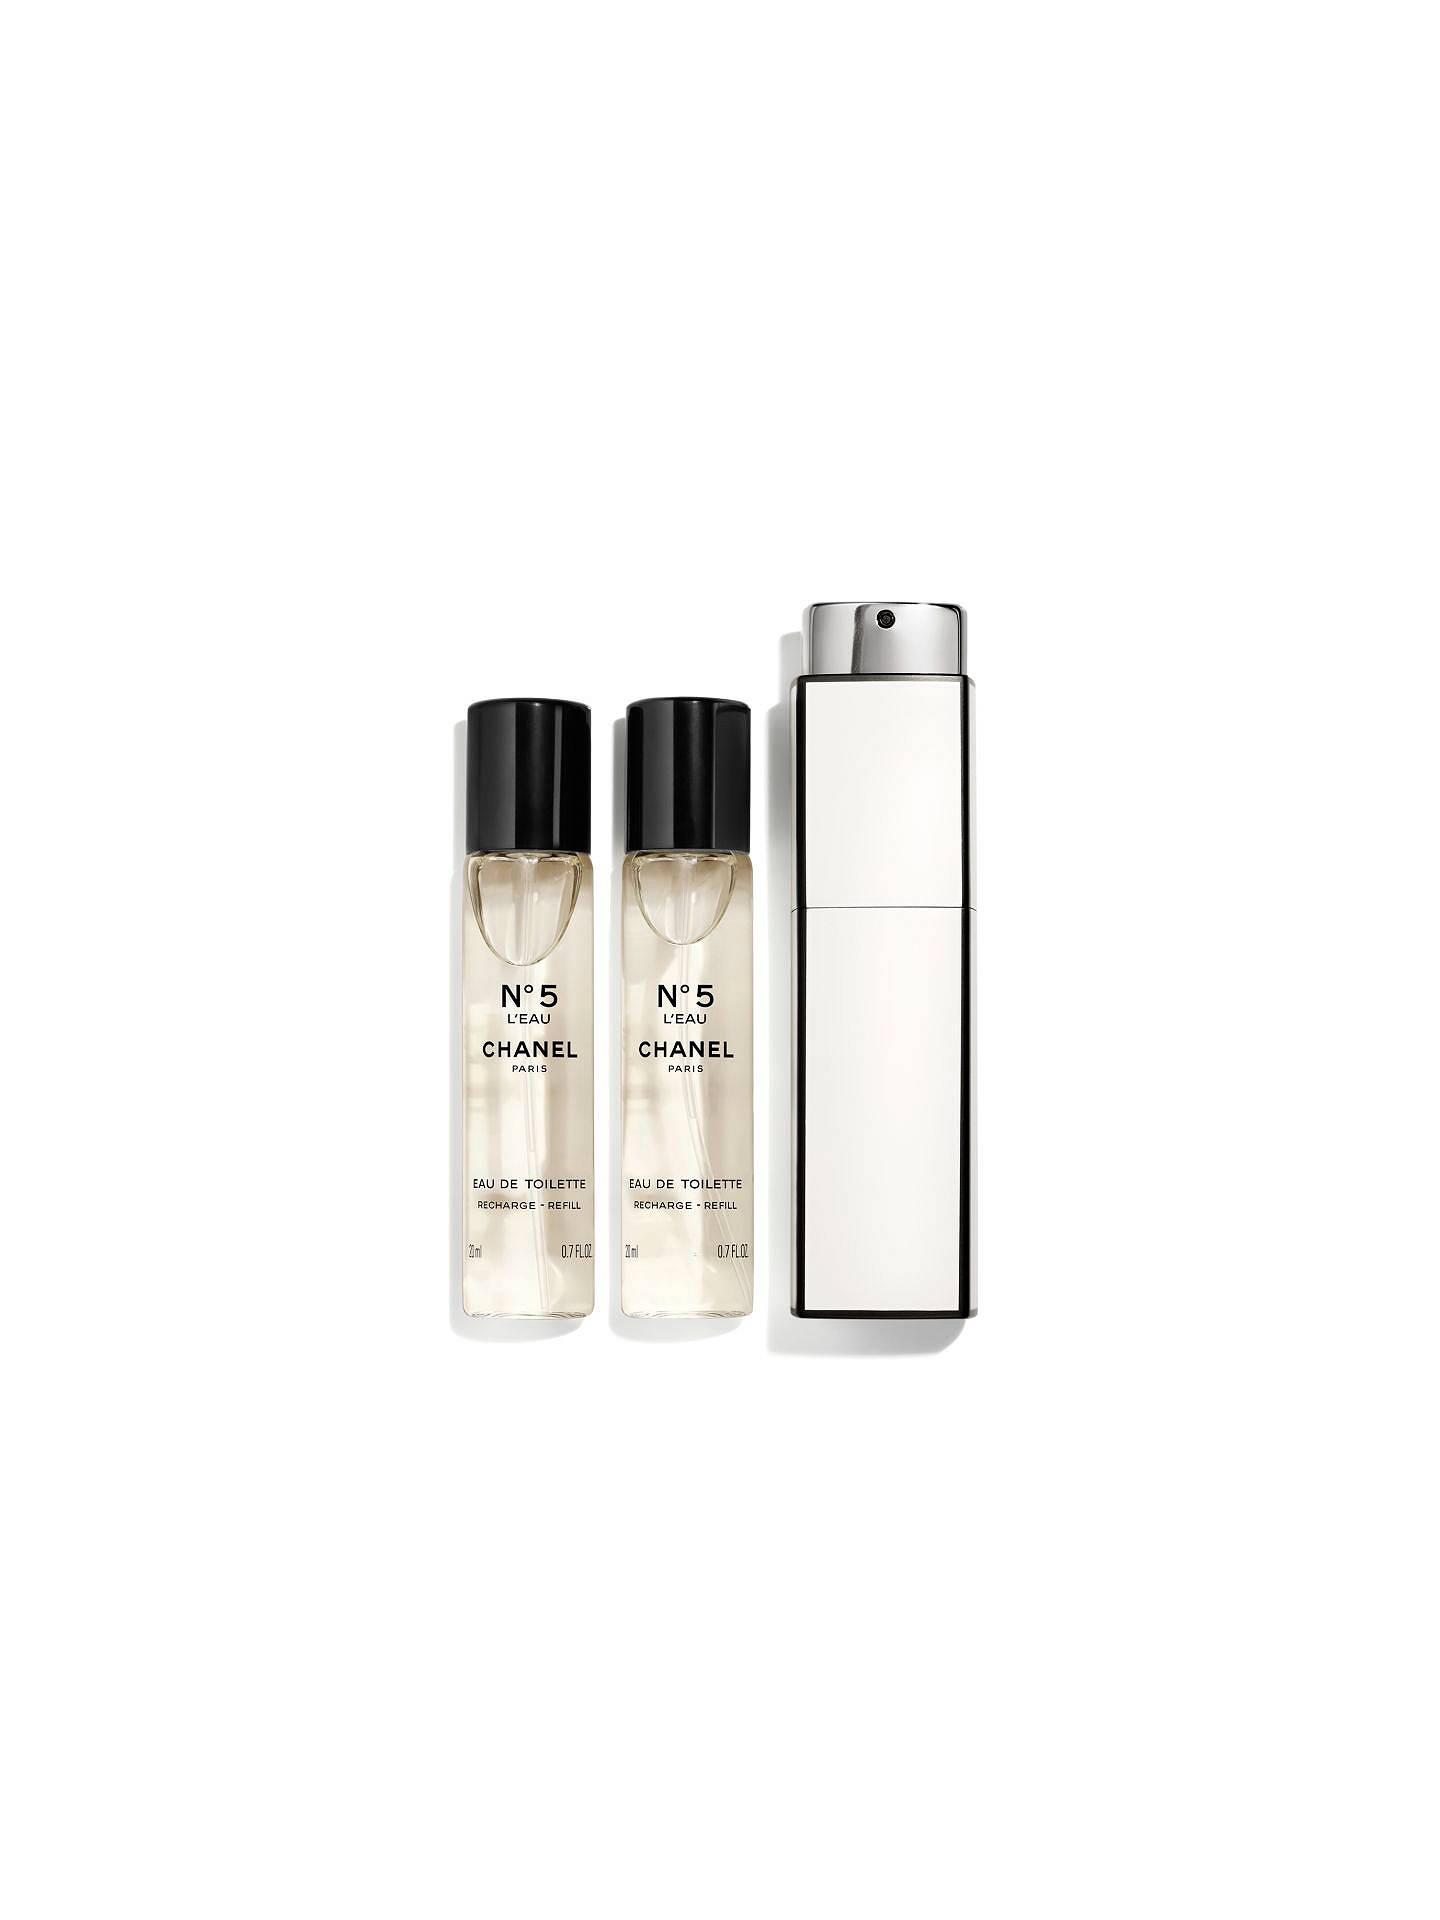 a8a38232eb7057 CHANEL N°5 L'Eau Purse Spray 3 x 20ml at John Lewis & Partners